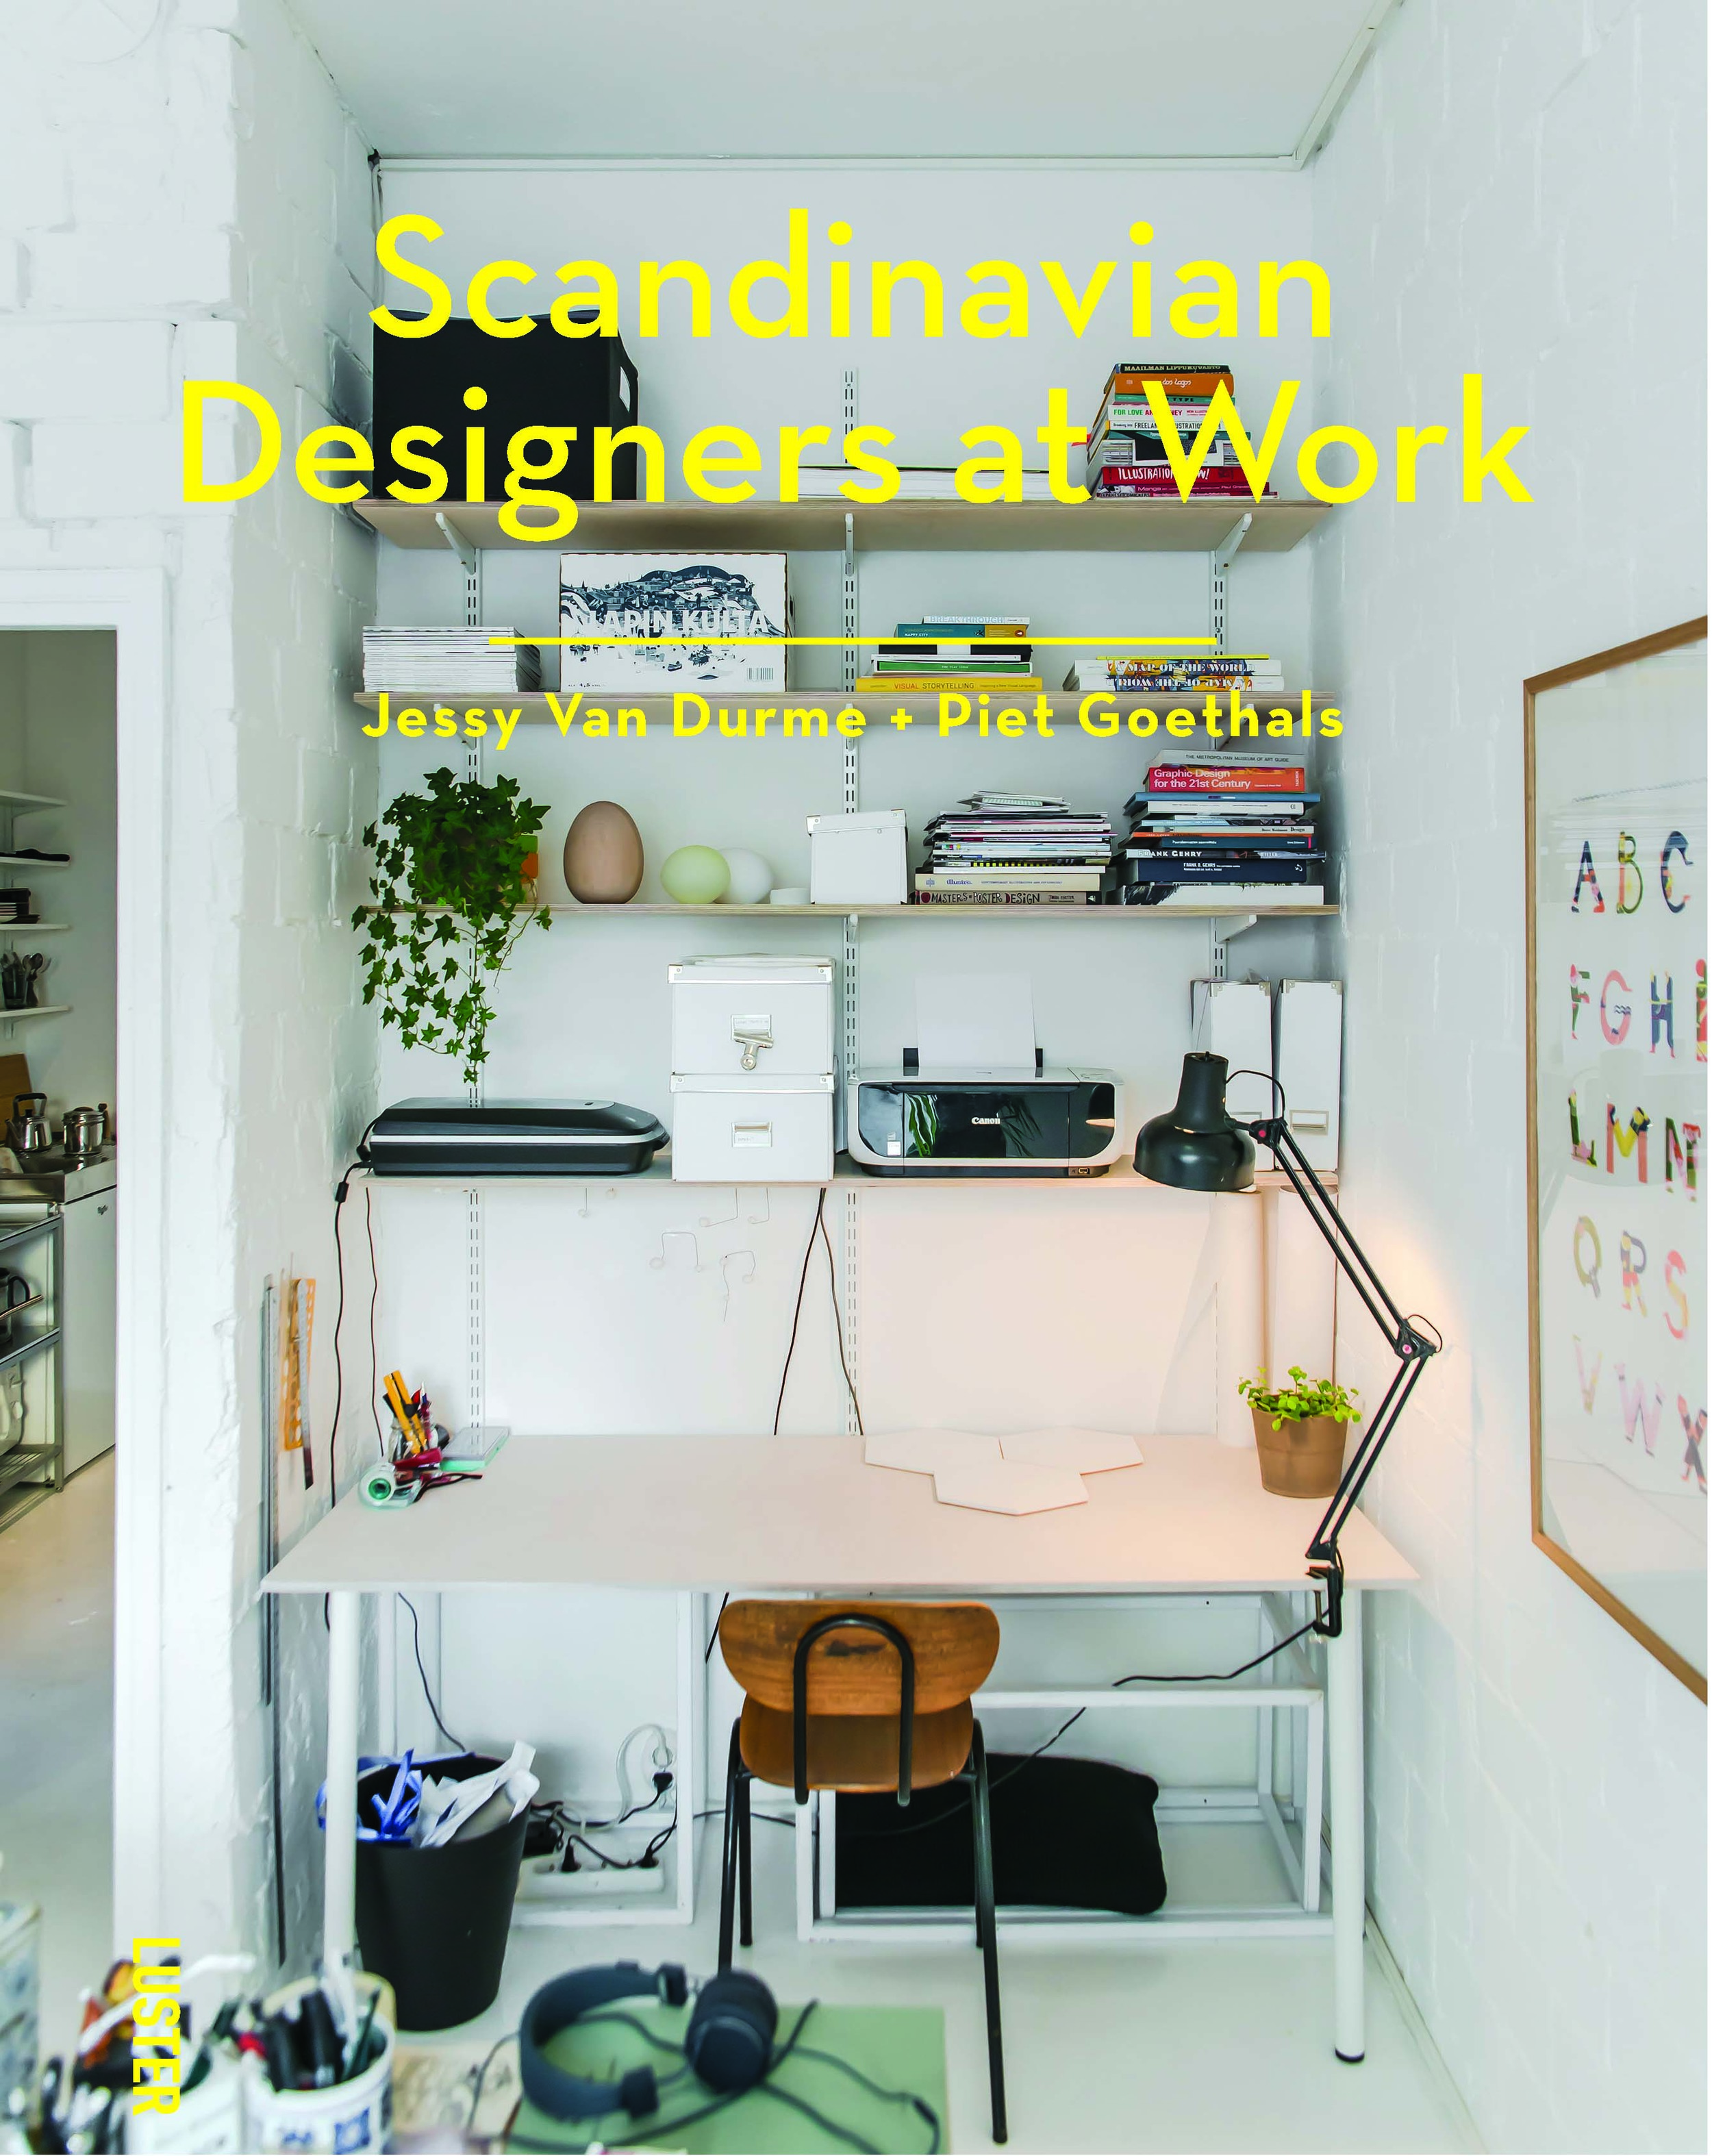 SSSCANDINAVIA_Cover_003_Page_2.jpg